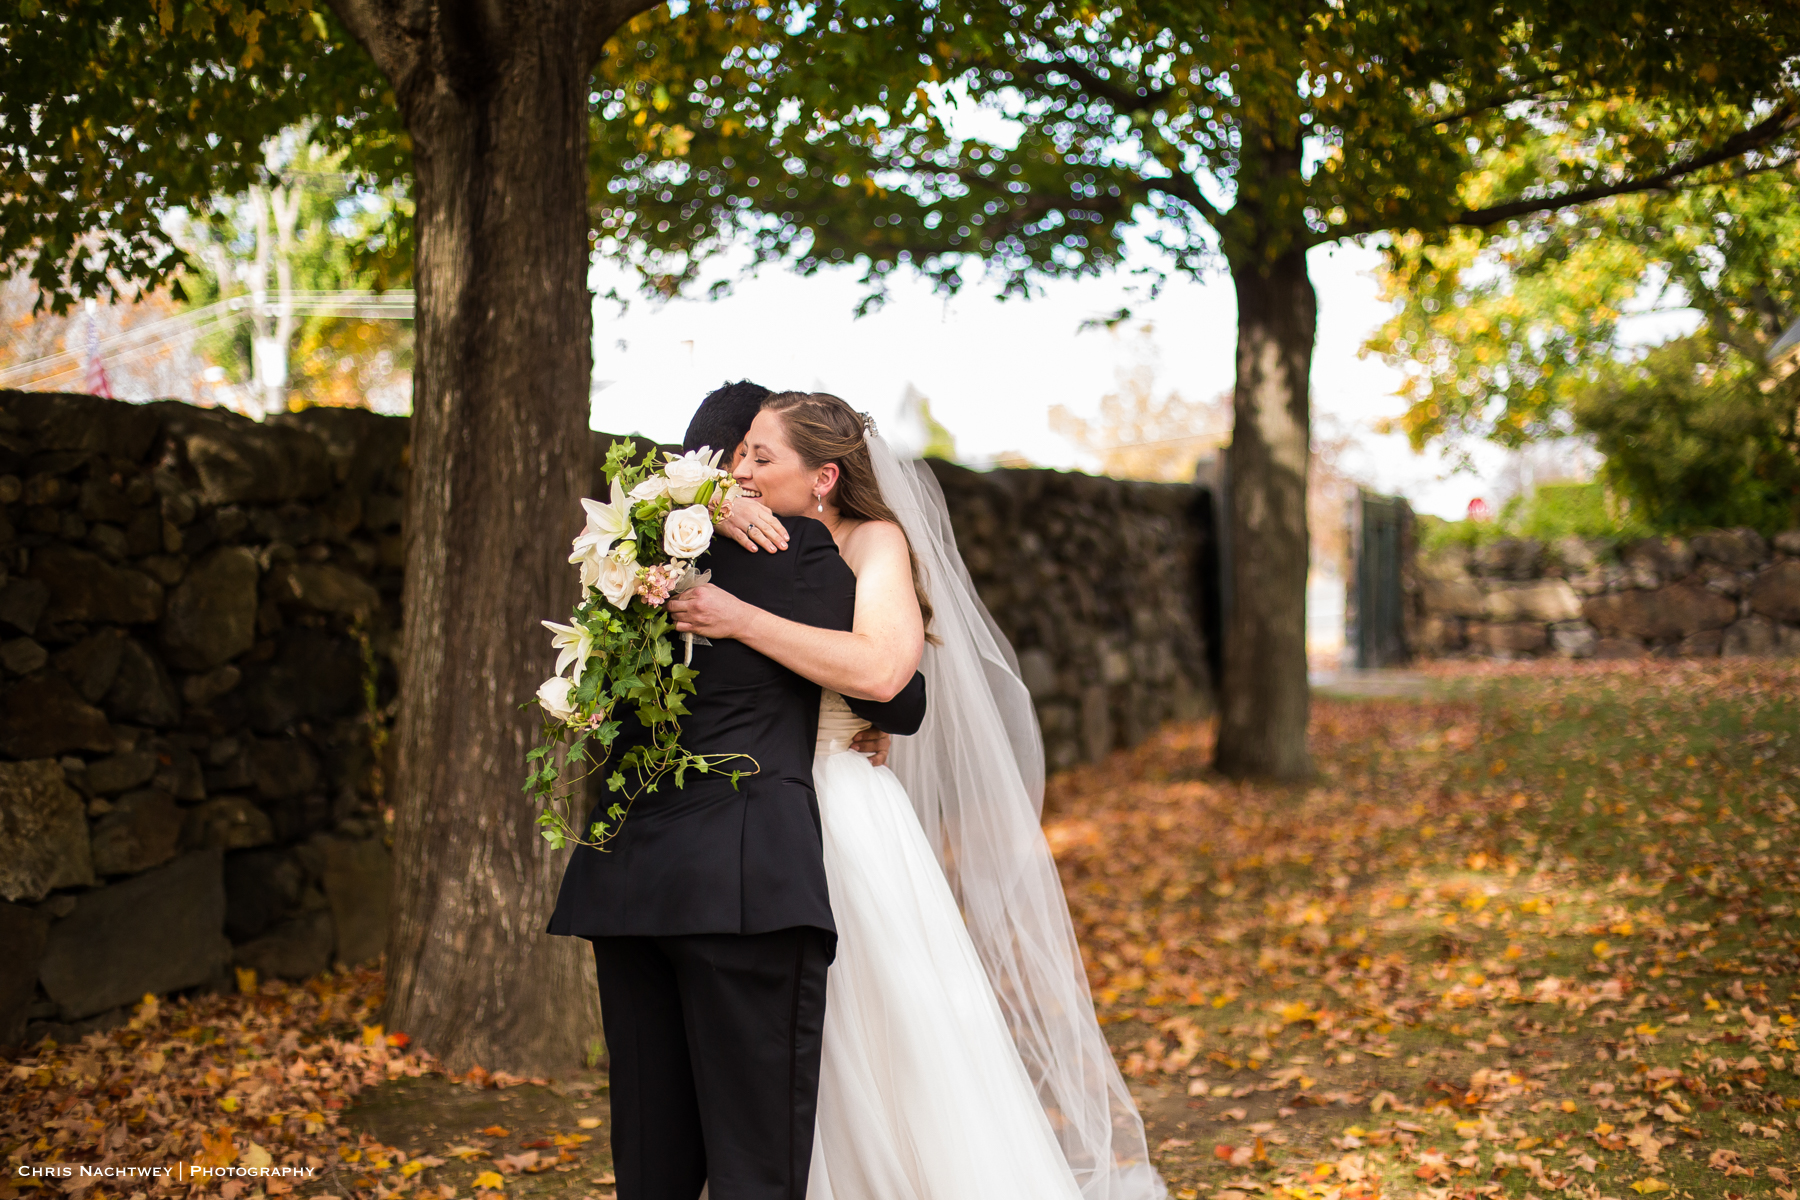 wedding-the-litchfield-inn-ct-photos-chris-nachtwey-photography-2018-19.jpg